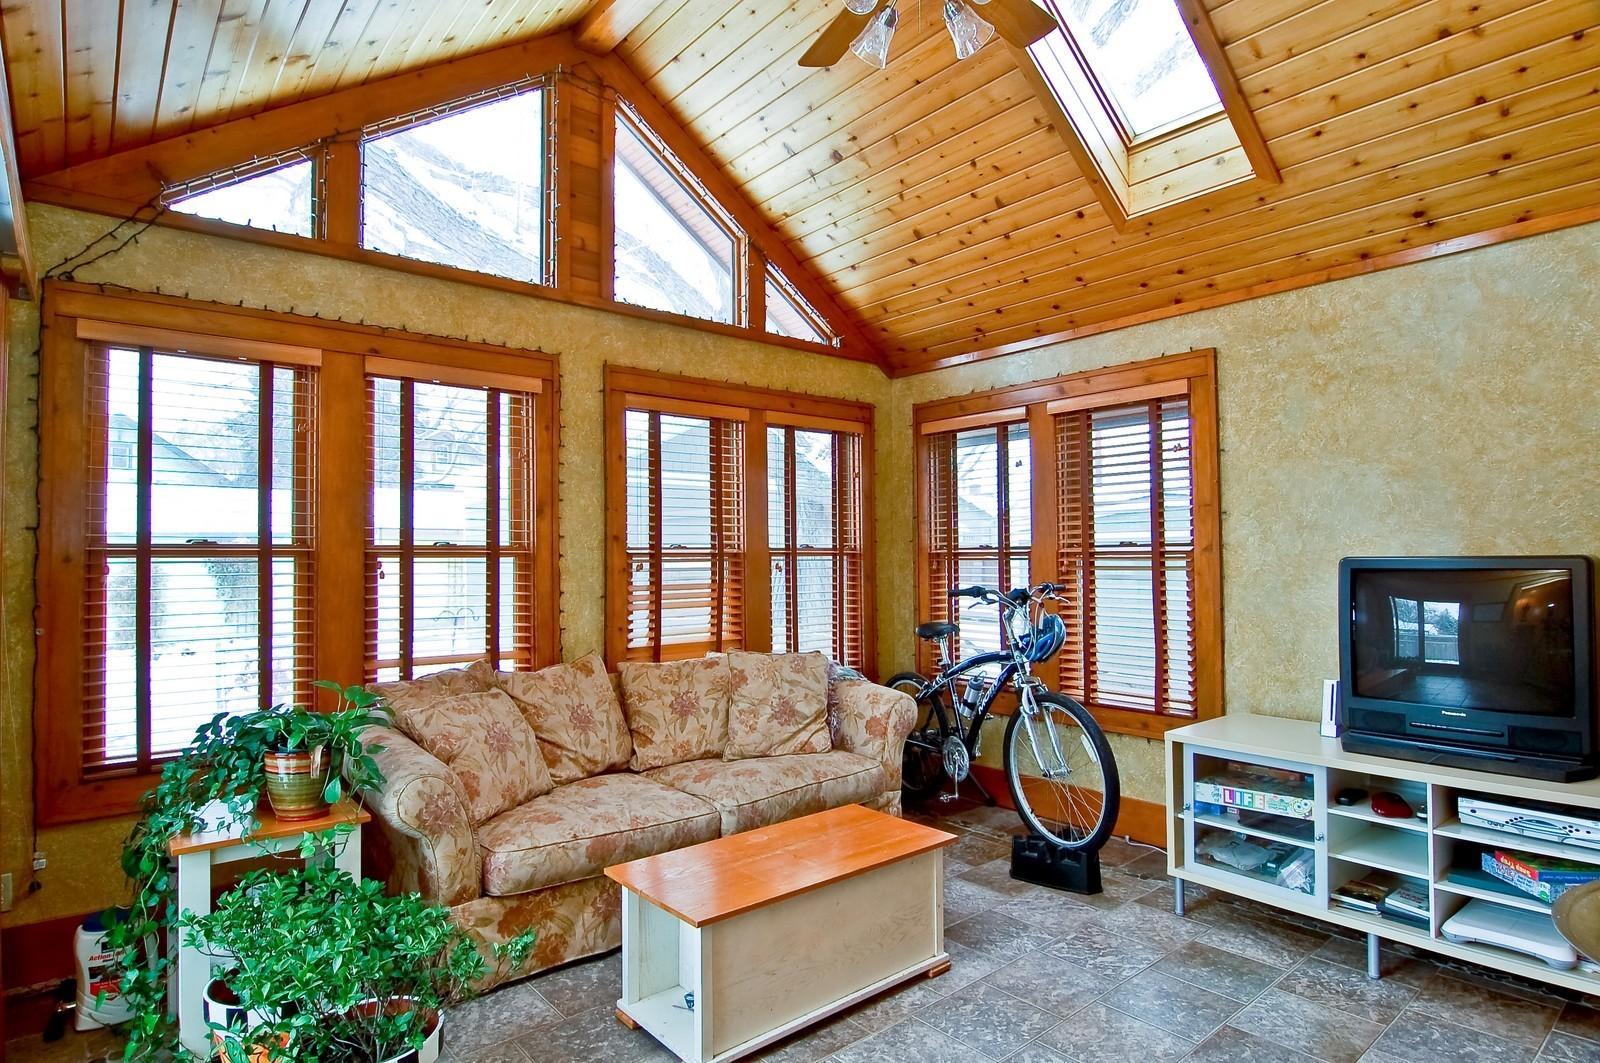 Real Estate Photography - 5012 Upton Avenue South, Minneapolis, MN, 55410 - Sun Room